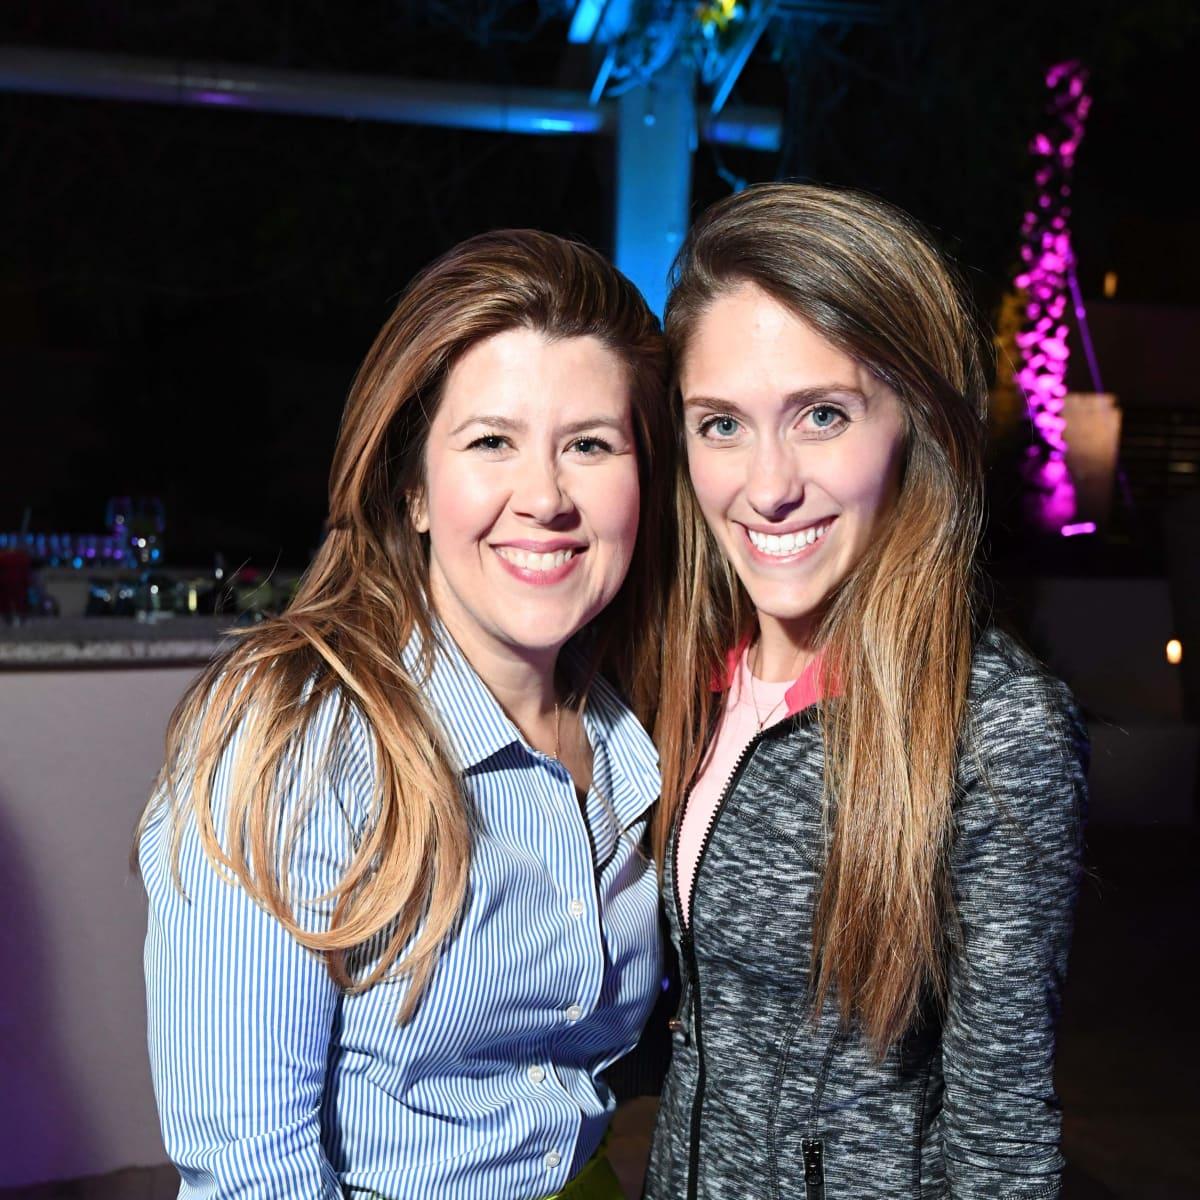 Four Seasons Spa opening, 4/16, Holly Crawford, Hilary Rosenstein